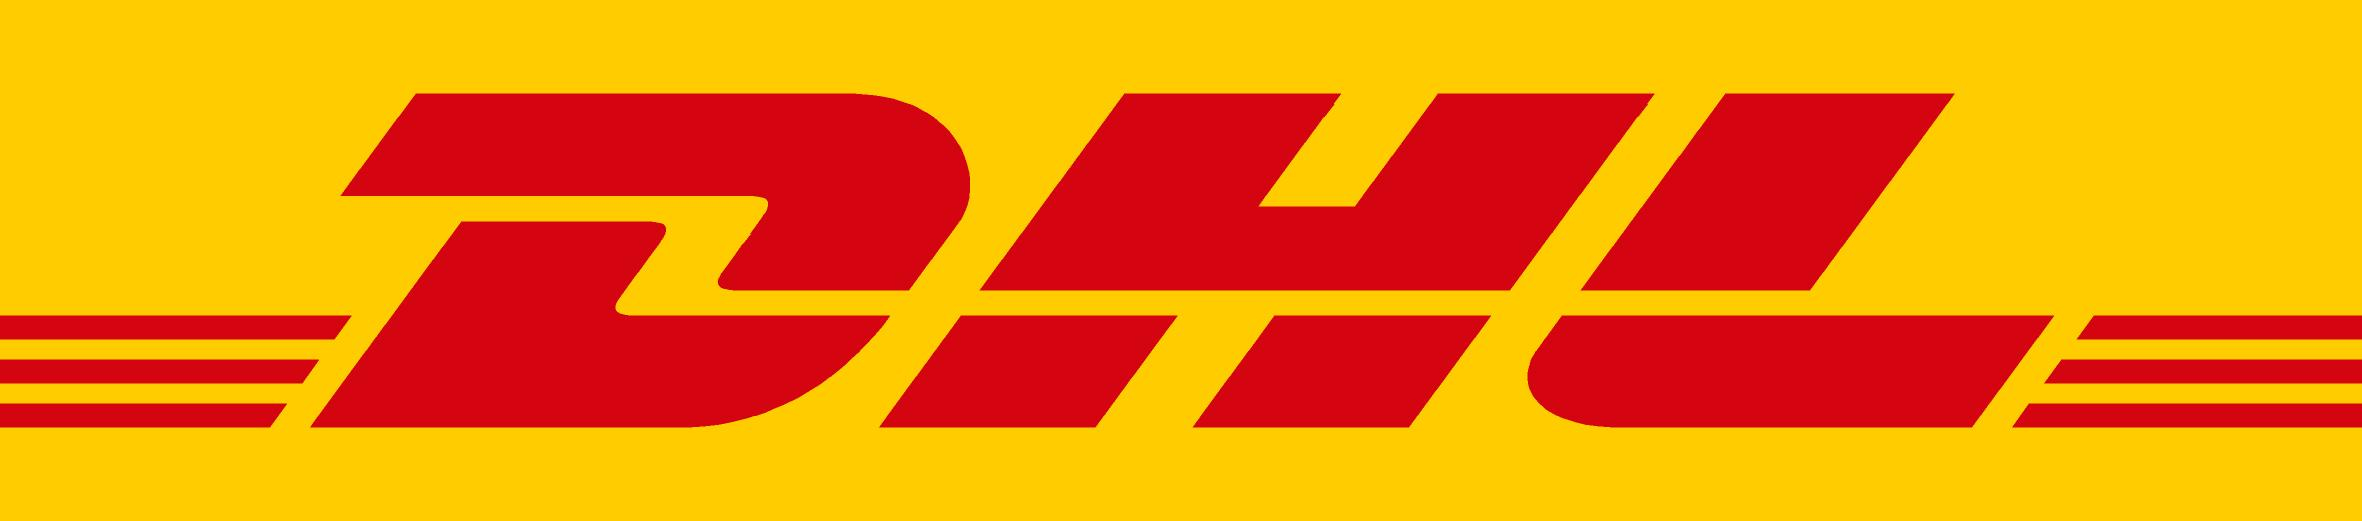 DHL_Logo1